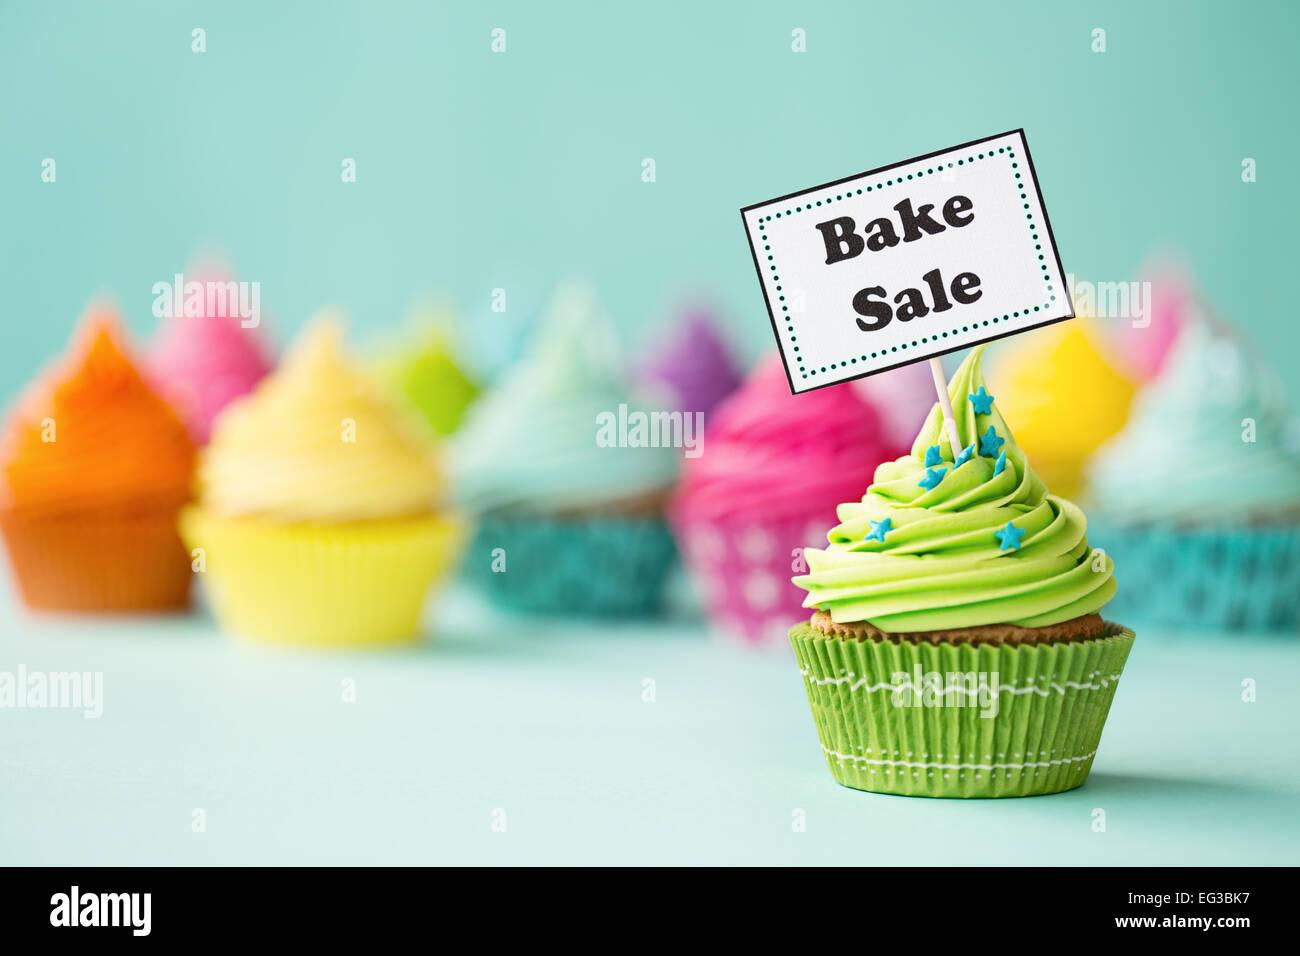 bake sale stock photos  u0026 bake sale stock images